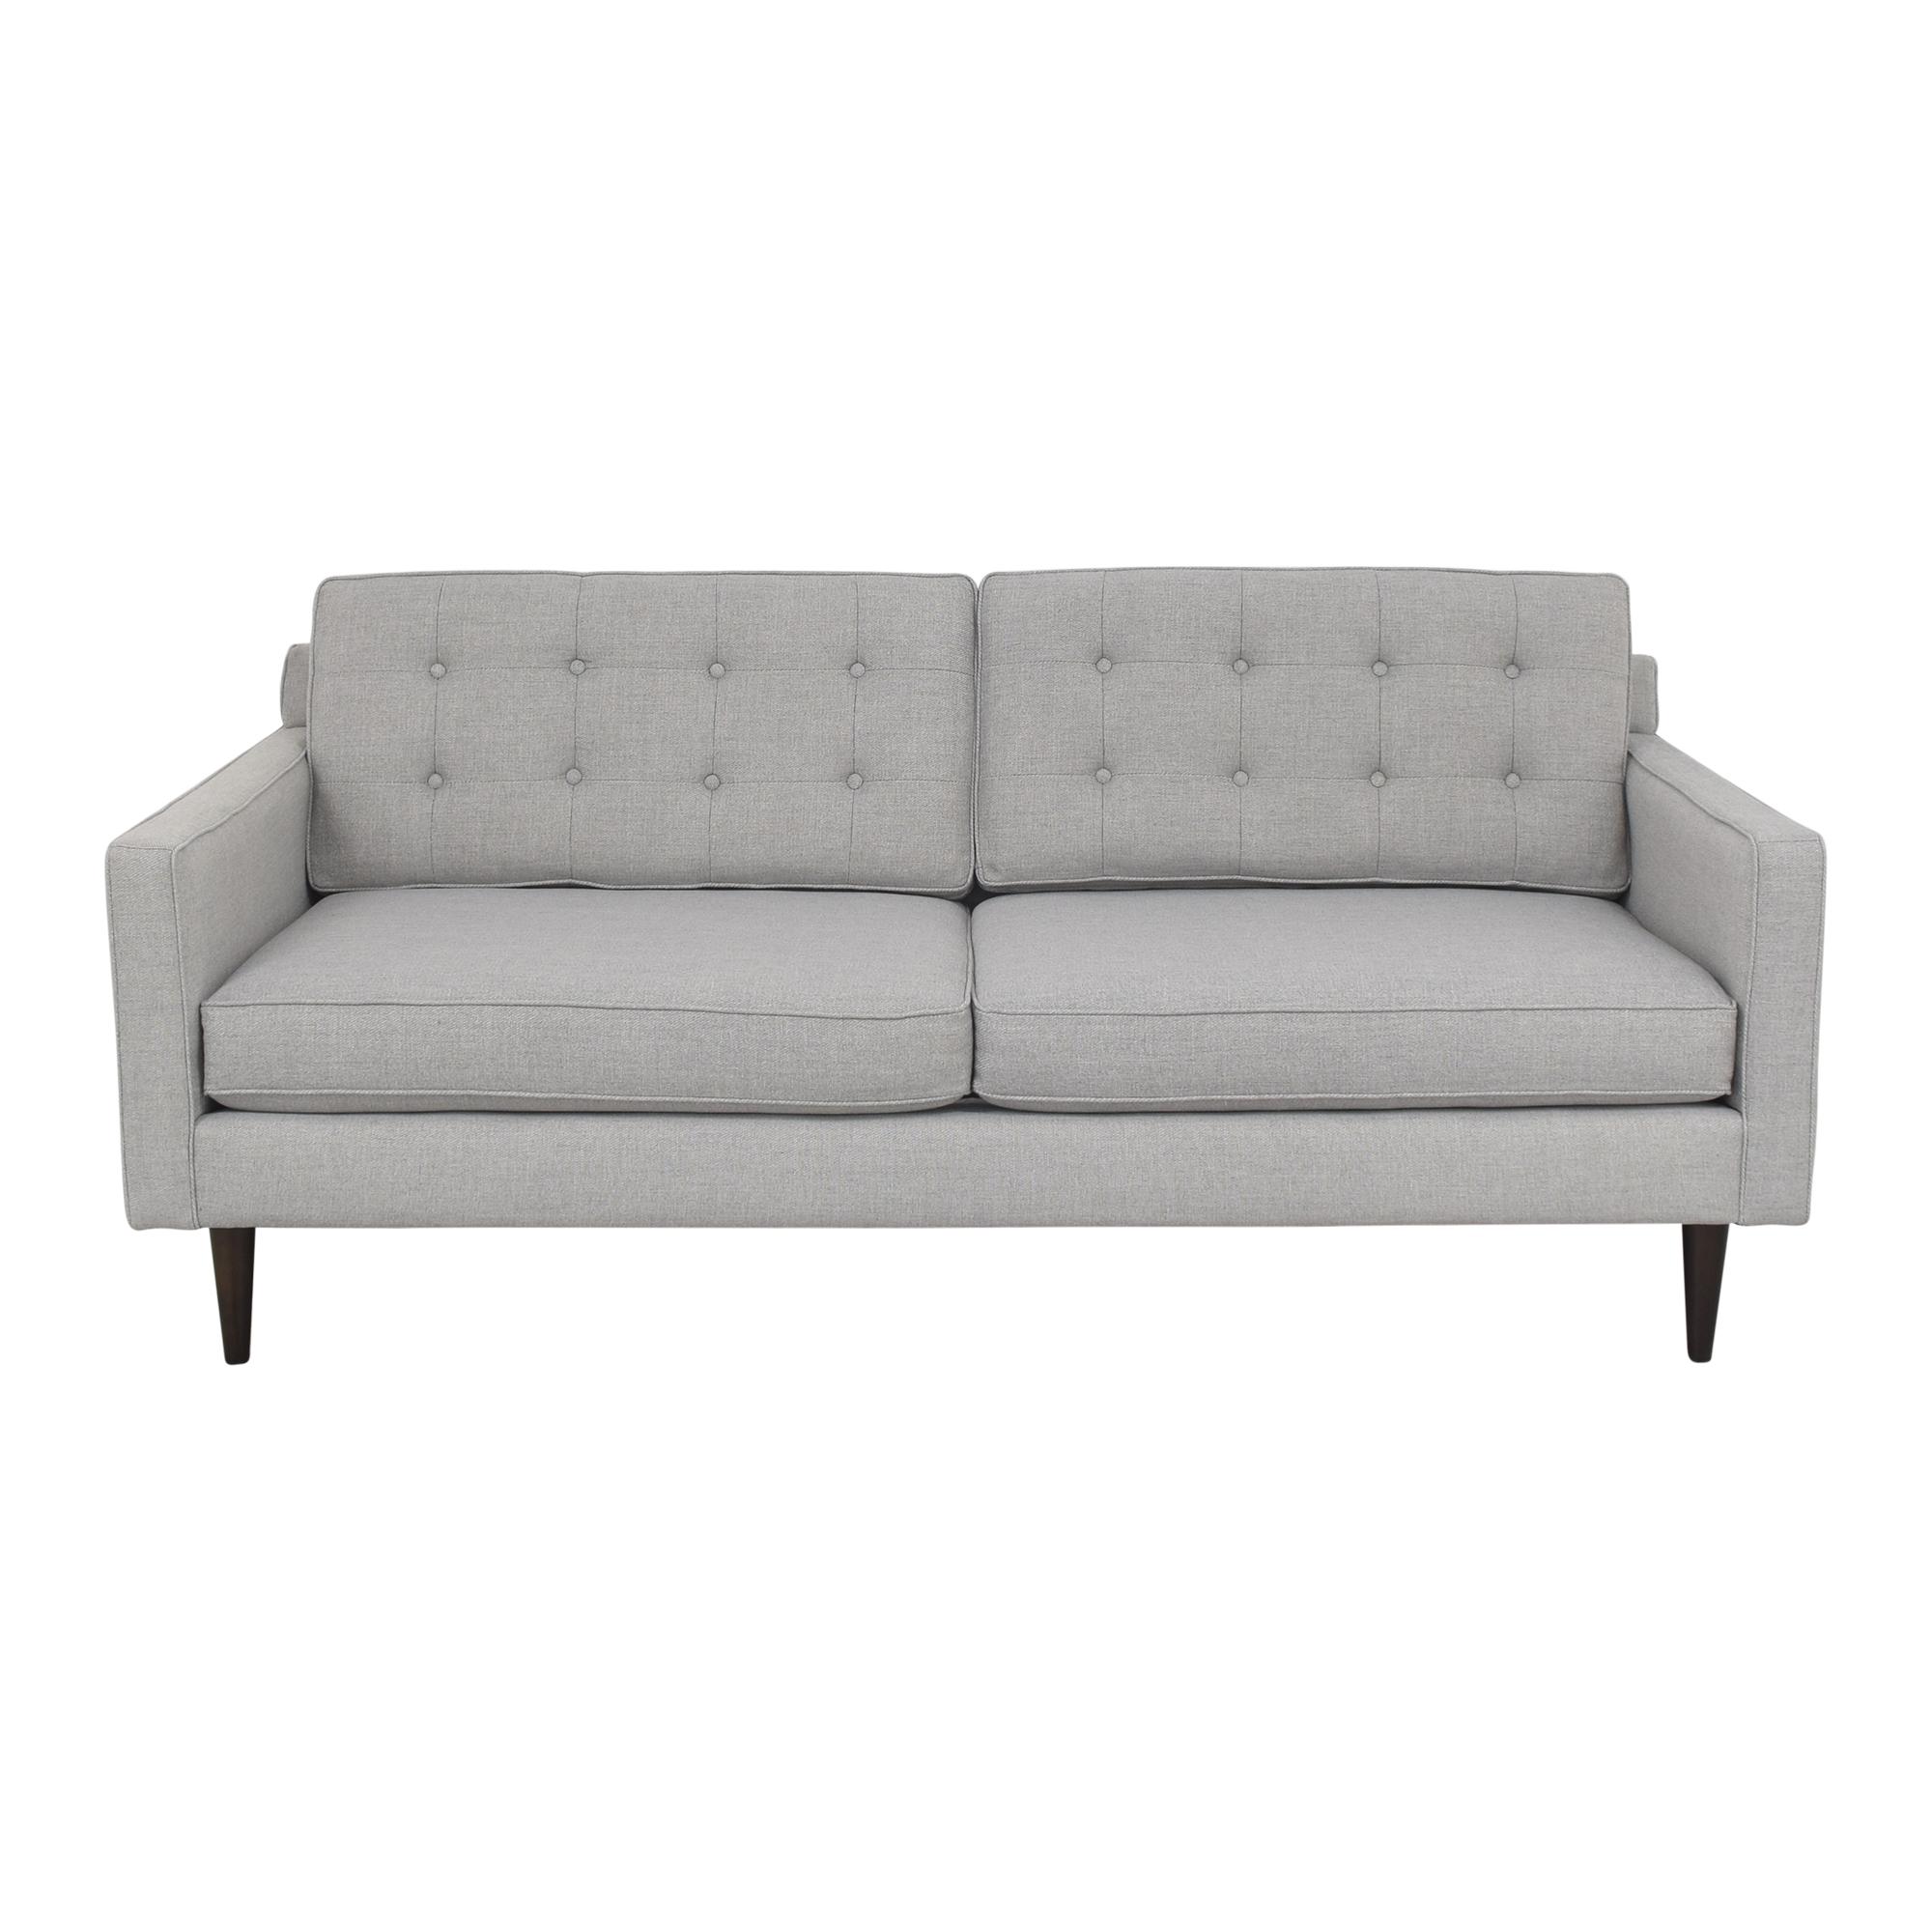 West Elm Drake Sofa sale